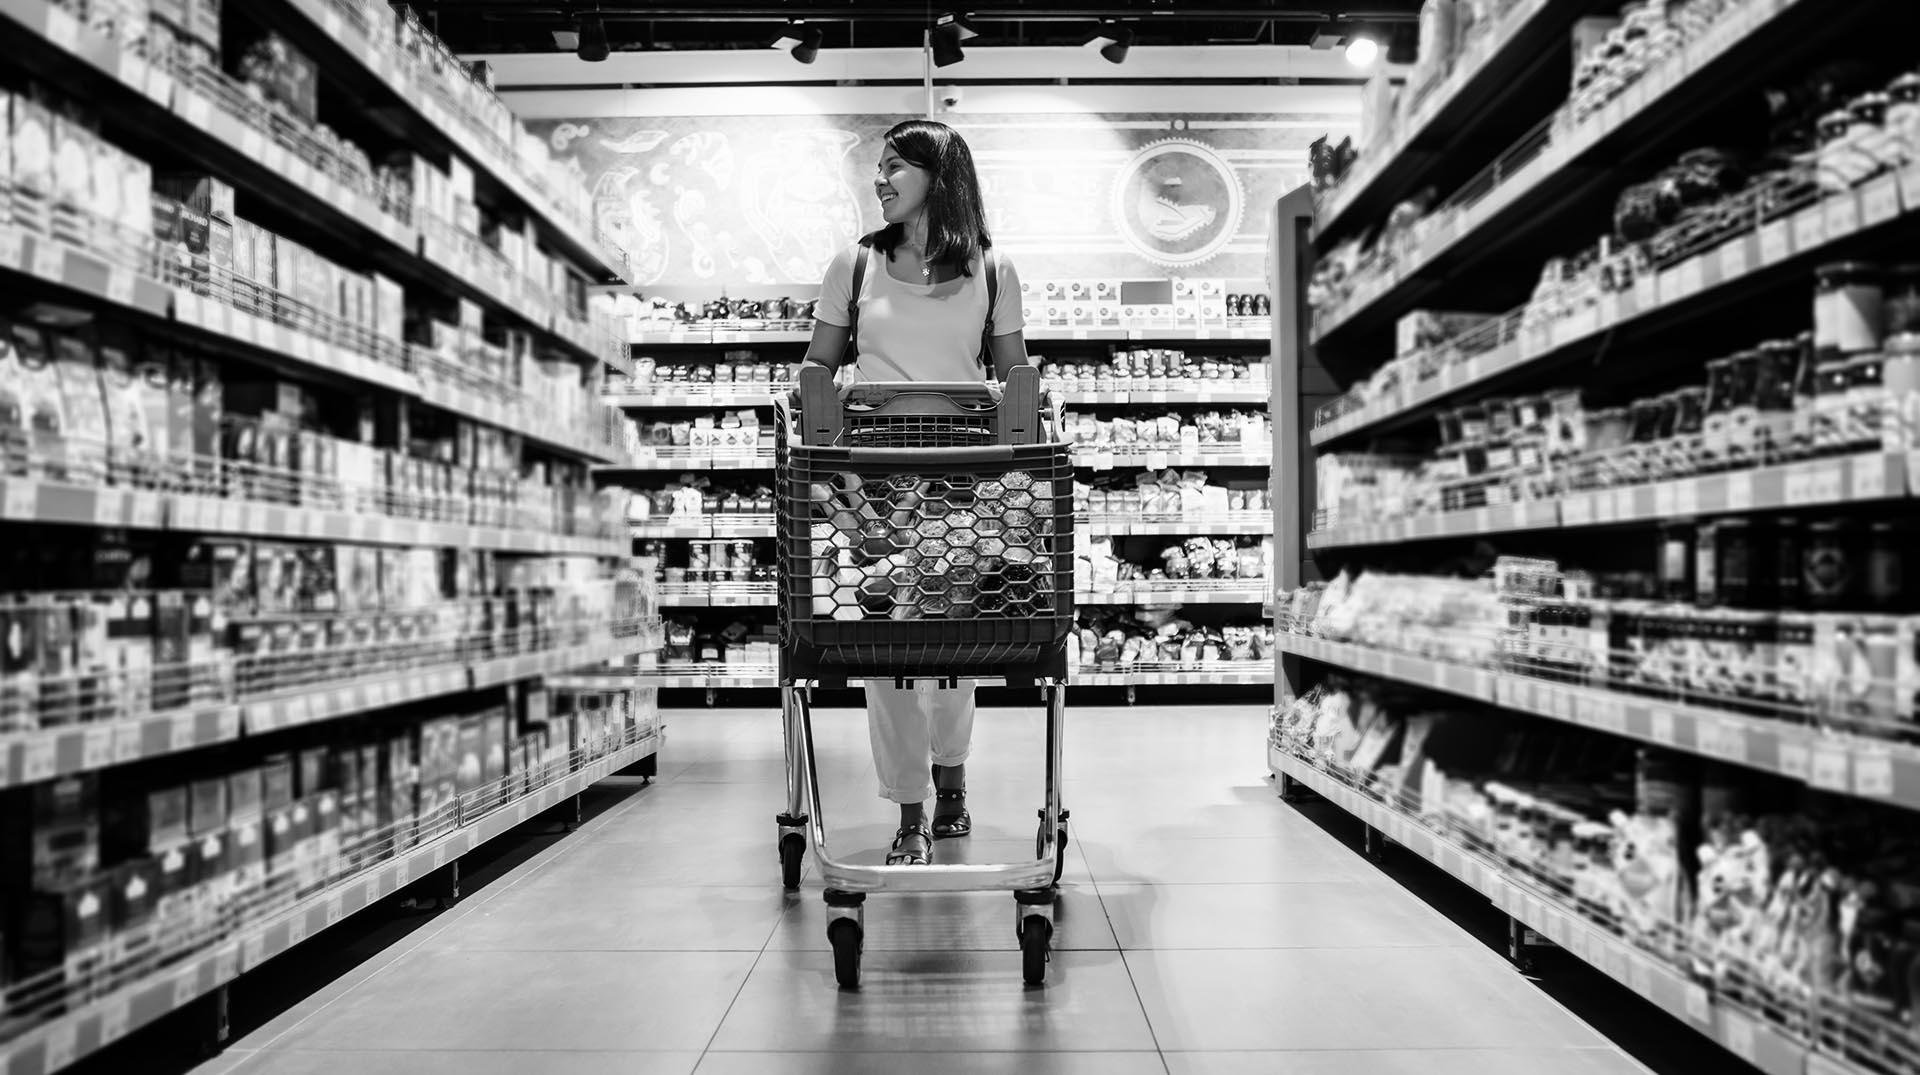 Markenanmeldung – ein Leitfaden